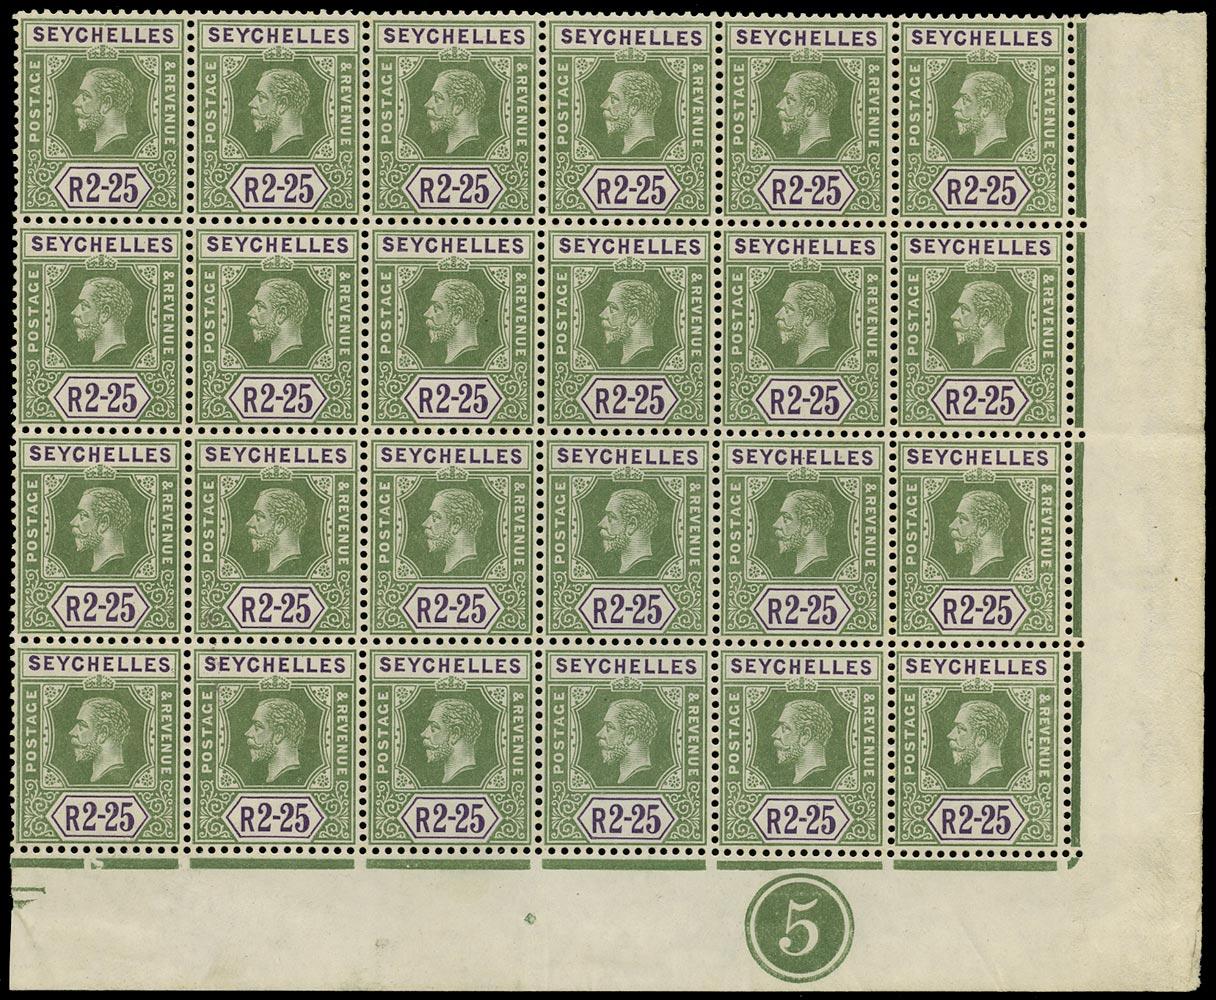 SEYCHELLES 1917  SG96 Mint unmounted KGV 2r25 watermark MCA